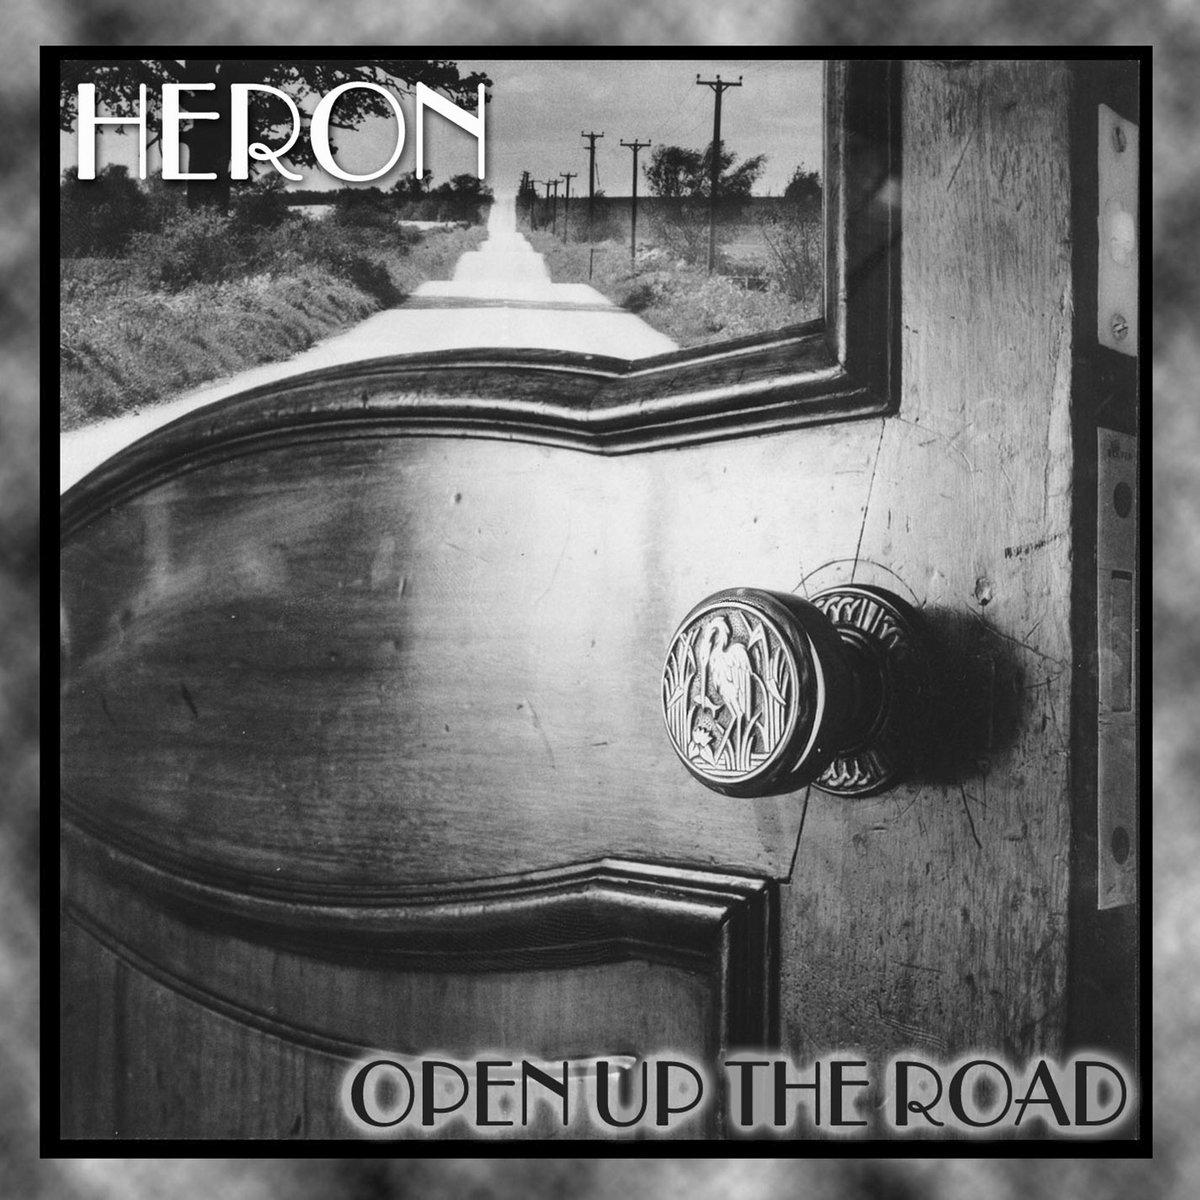 「HERON (UK) / OPEN UP THE ROAD」の画像検索結果